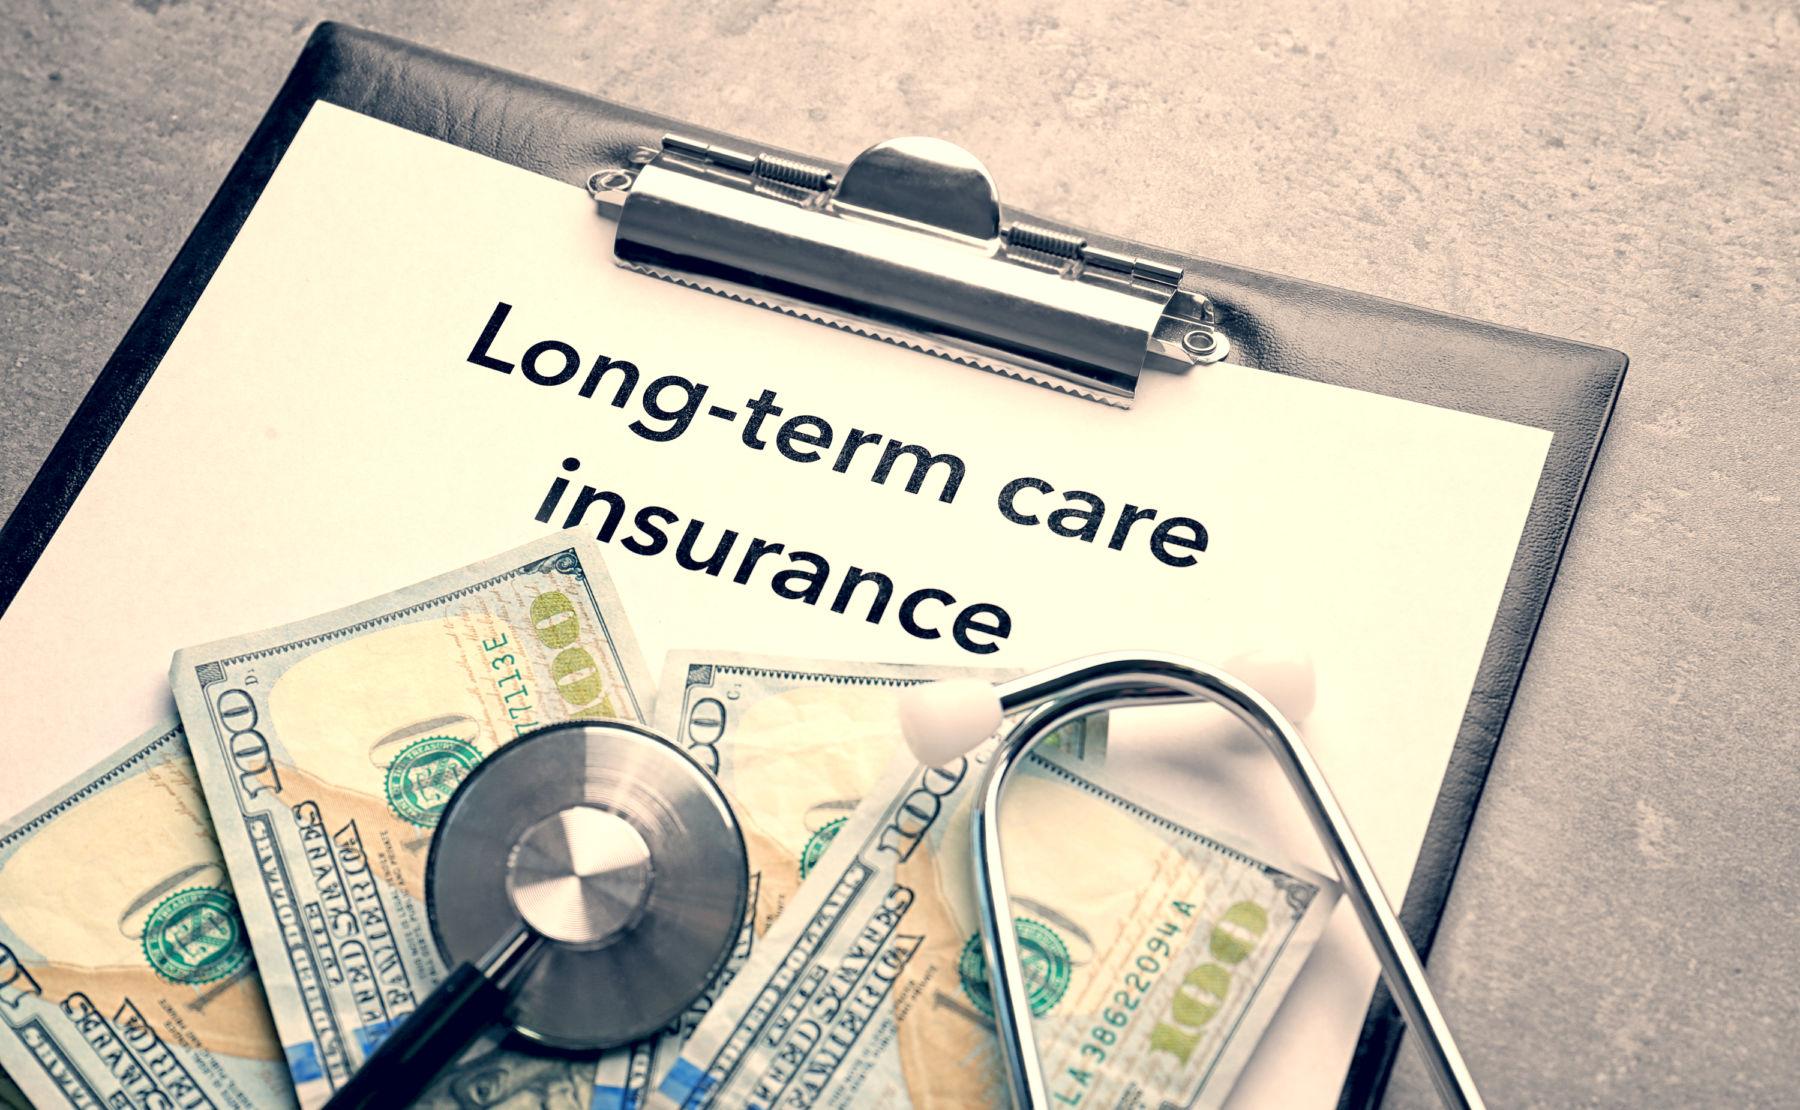 Is Long-Term Care Insurance Really a Good Idea?